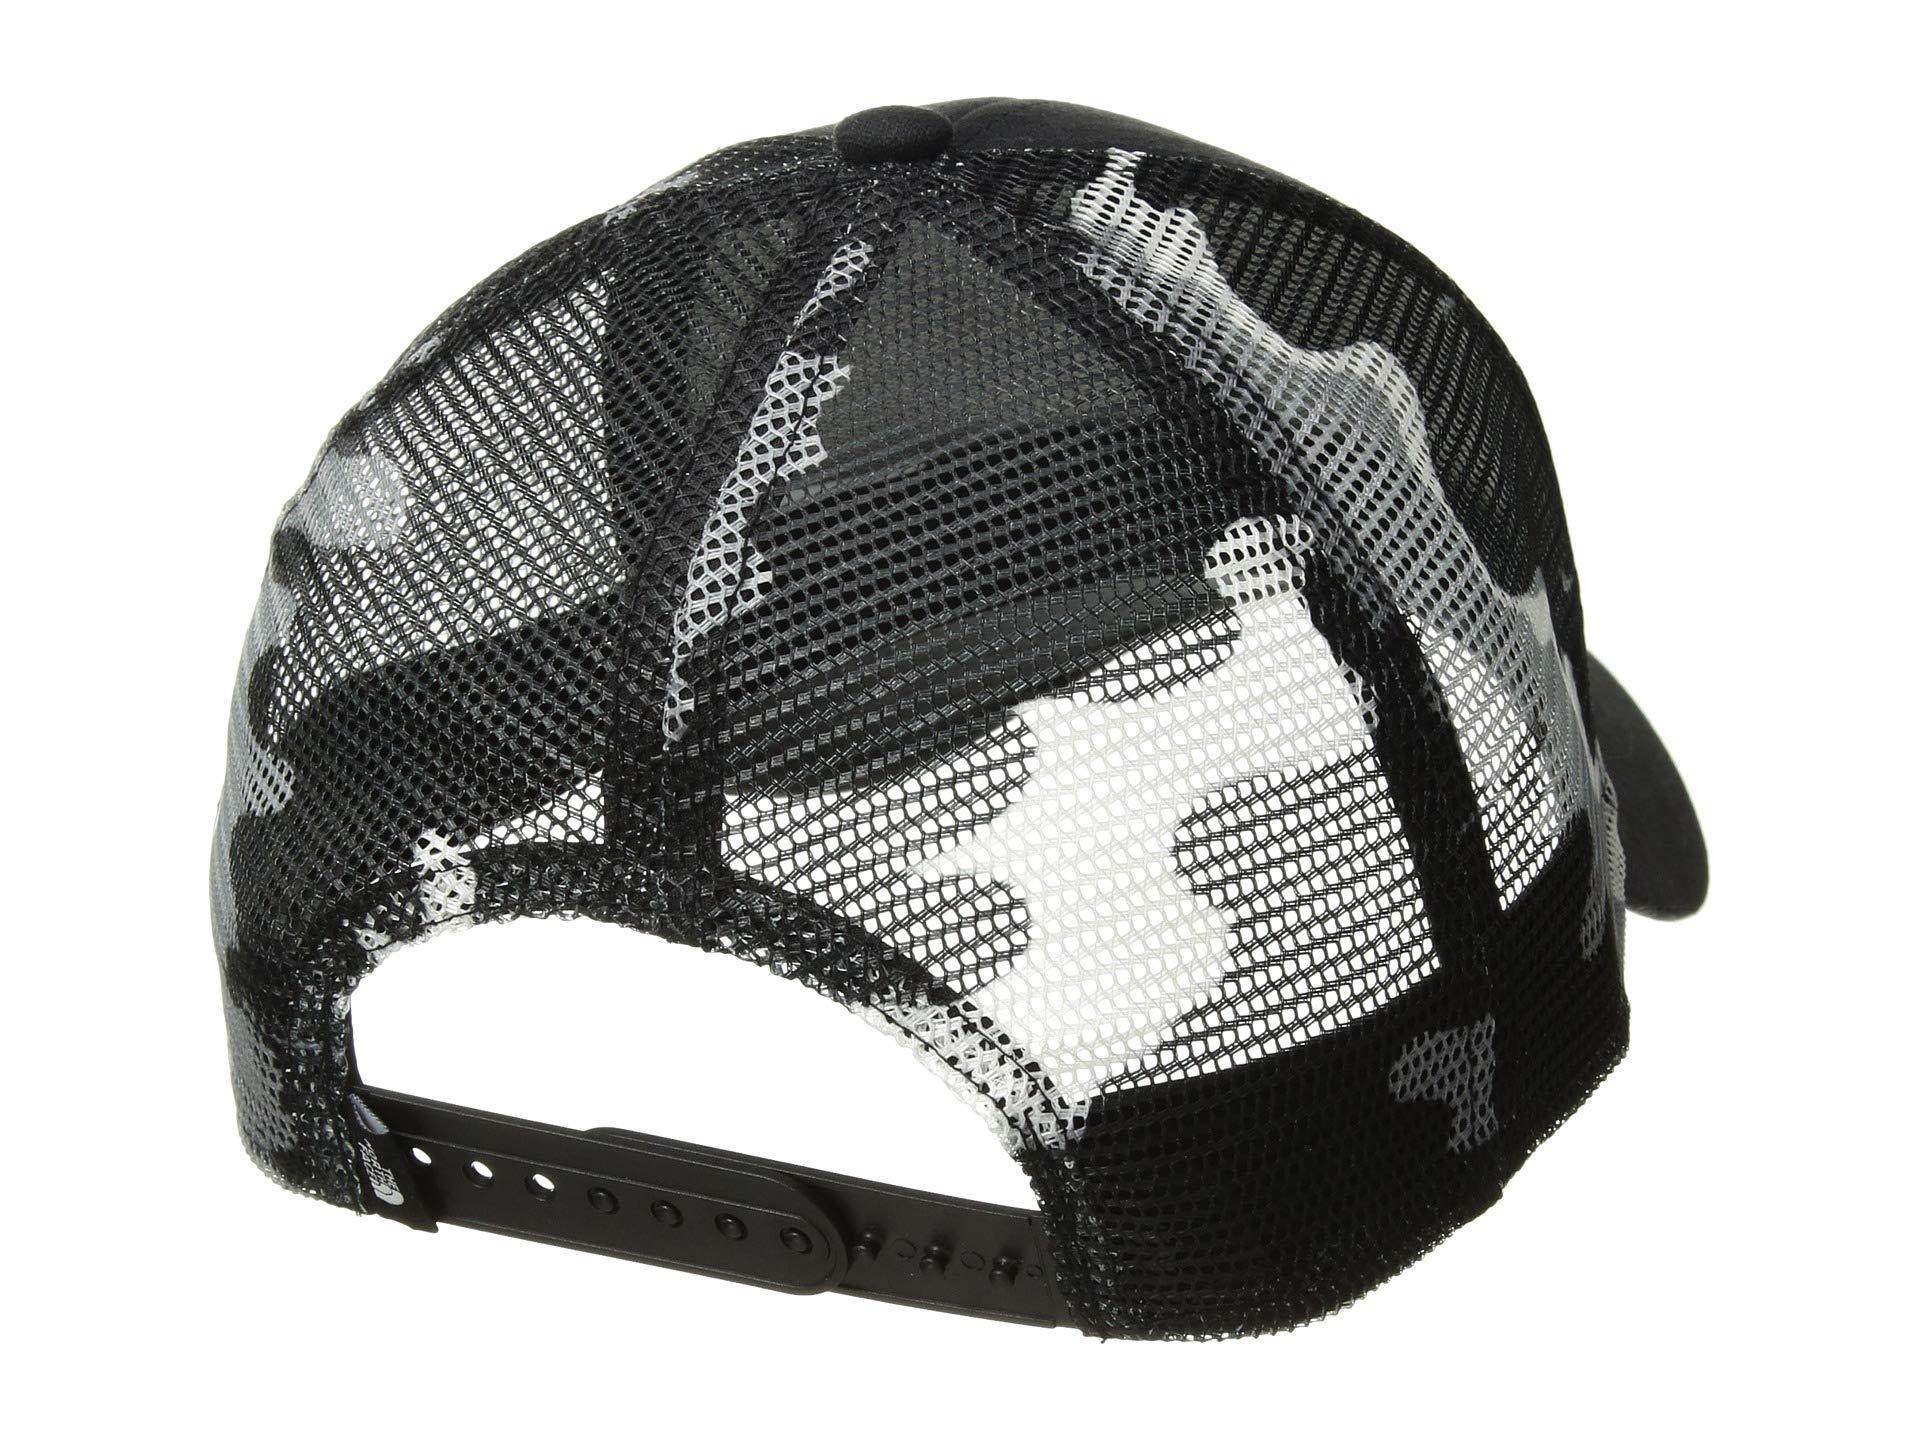 f5084cf483576 The North Face - Black Mudder Novelty Mesh Trucker Hat (moab Khaki Woodchip  Camo Desert. View fullscreen